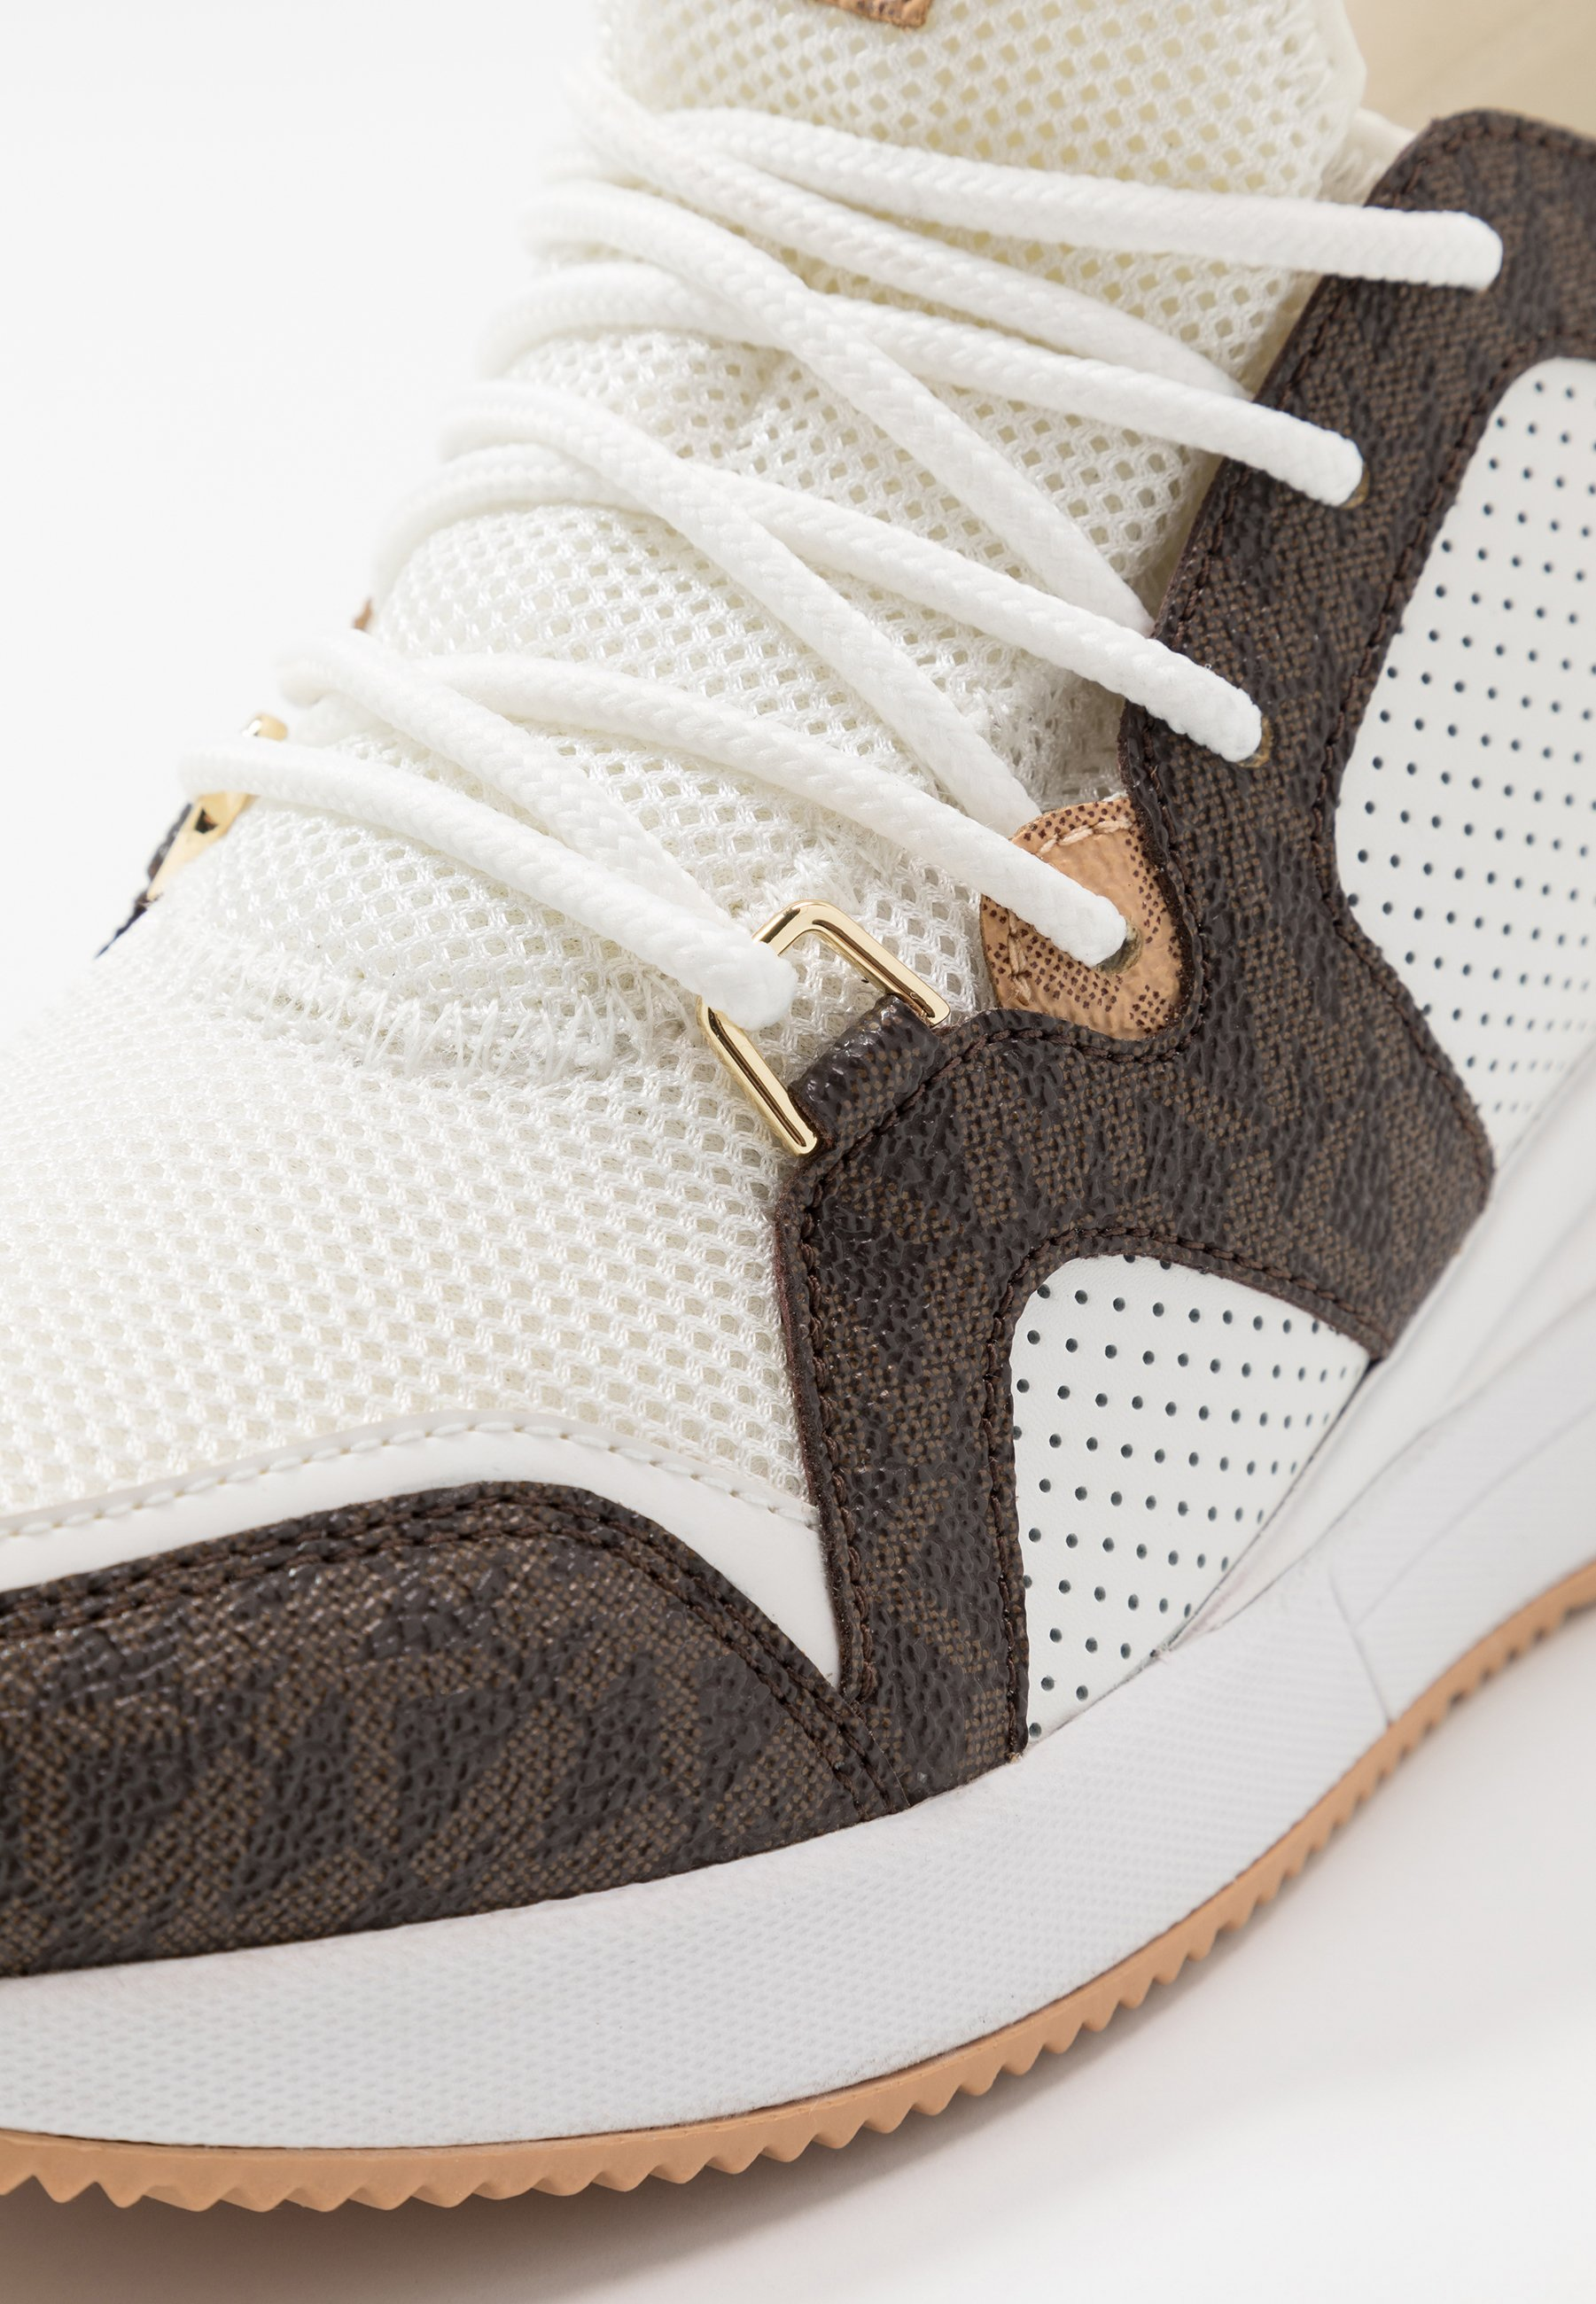 LIV TRAINER Sneakers optic whitebrown